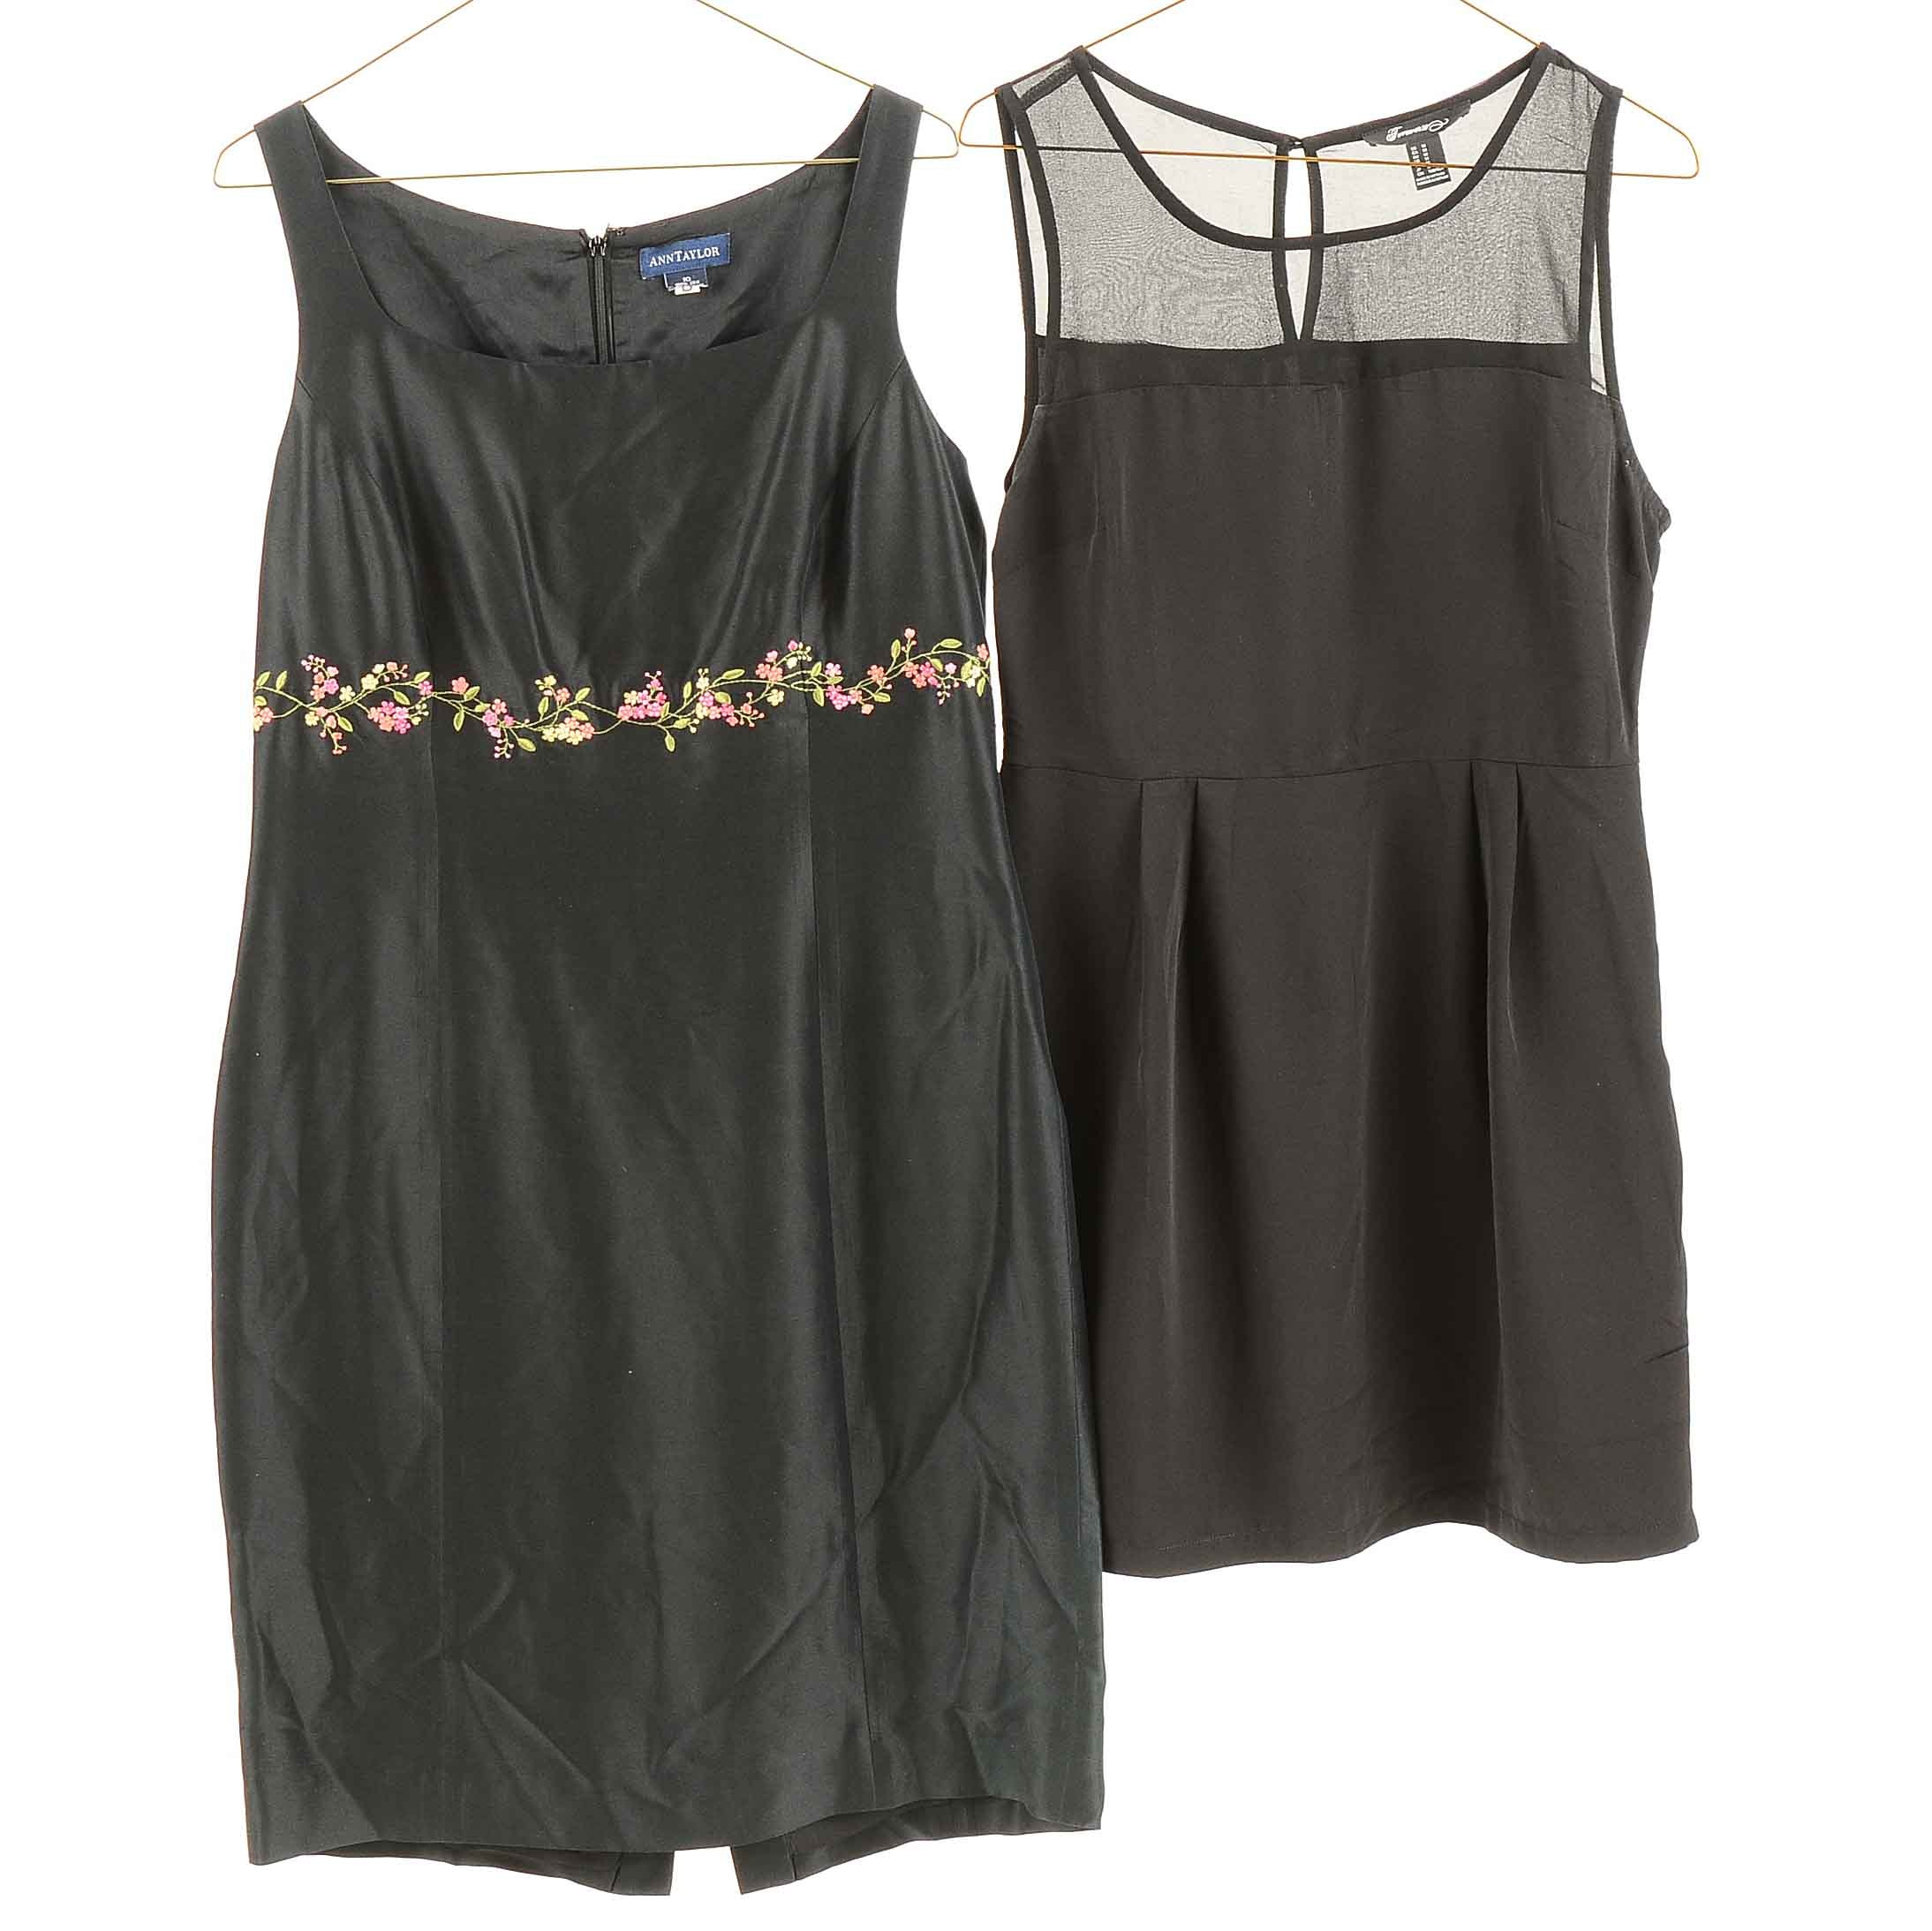 Sleeveless Ann Taylor and Forever 21 Black Dresses